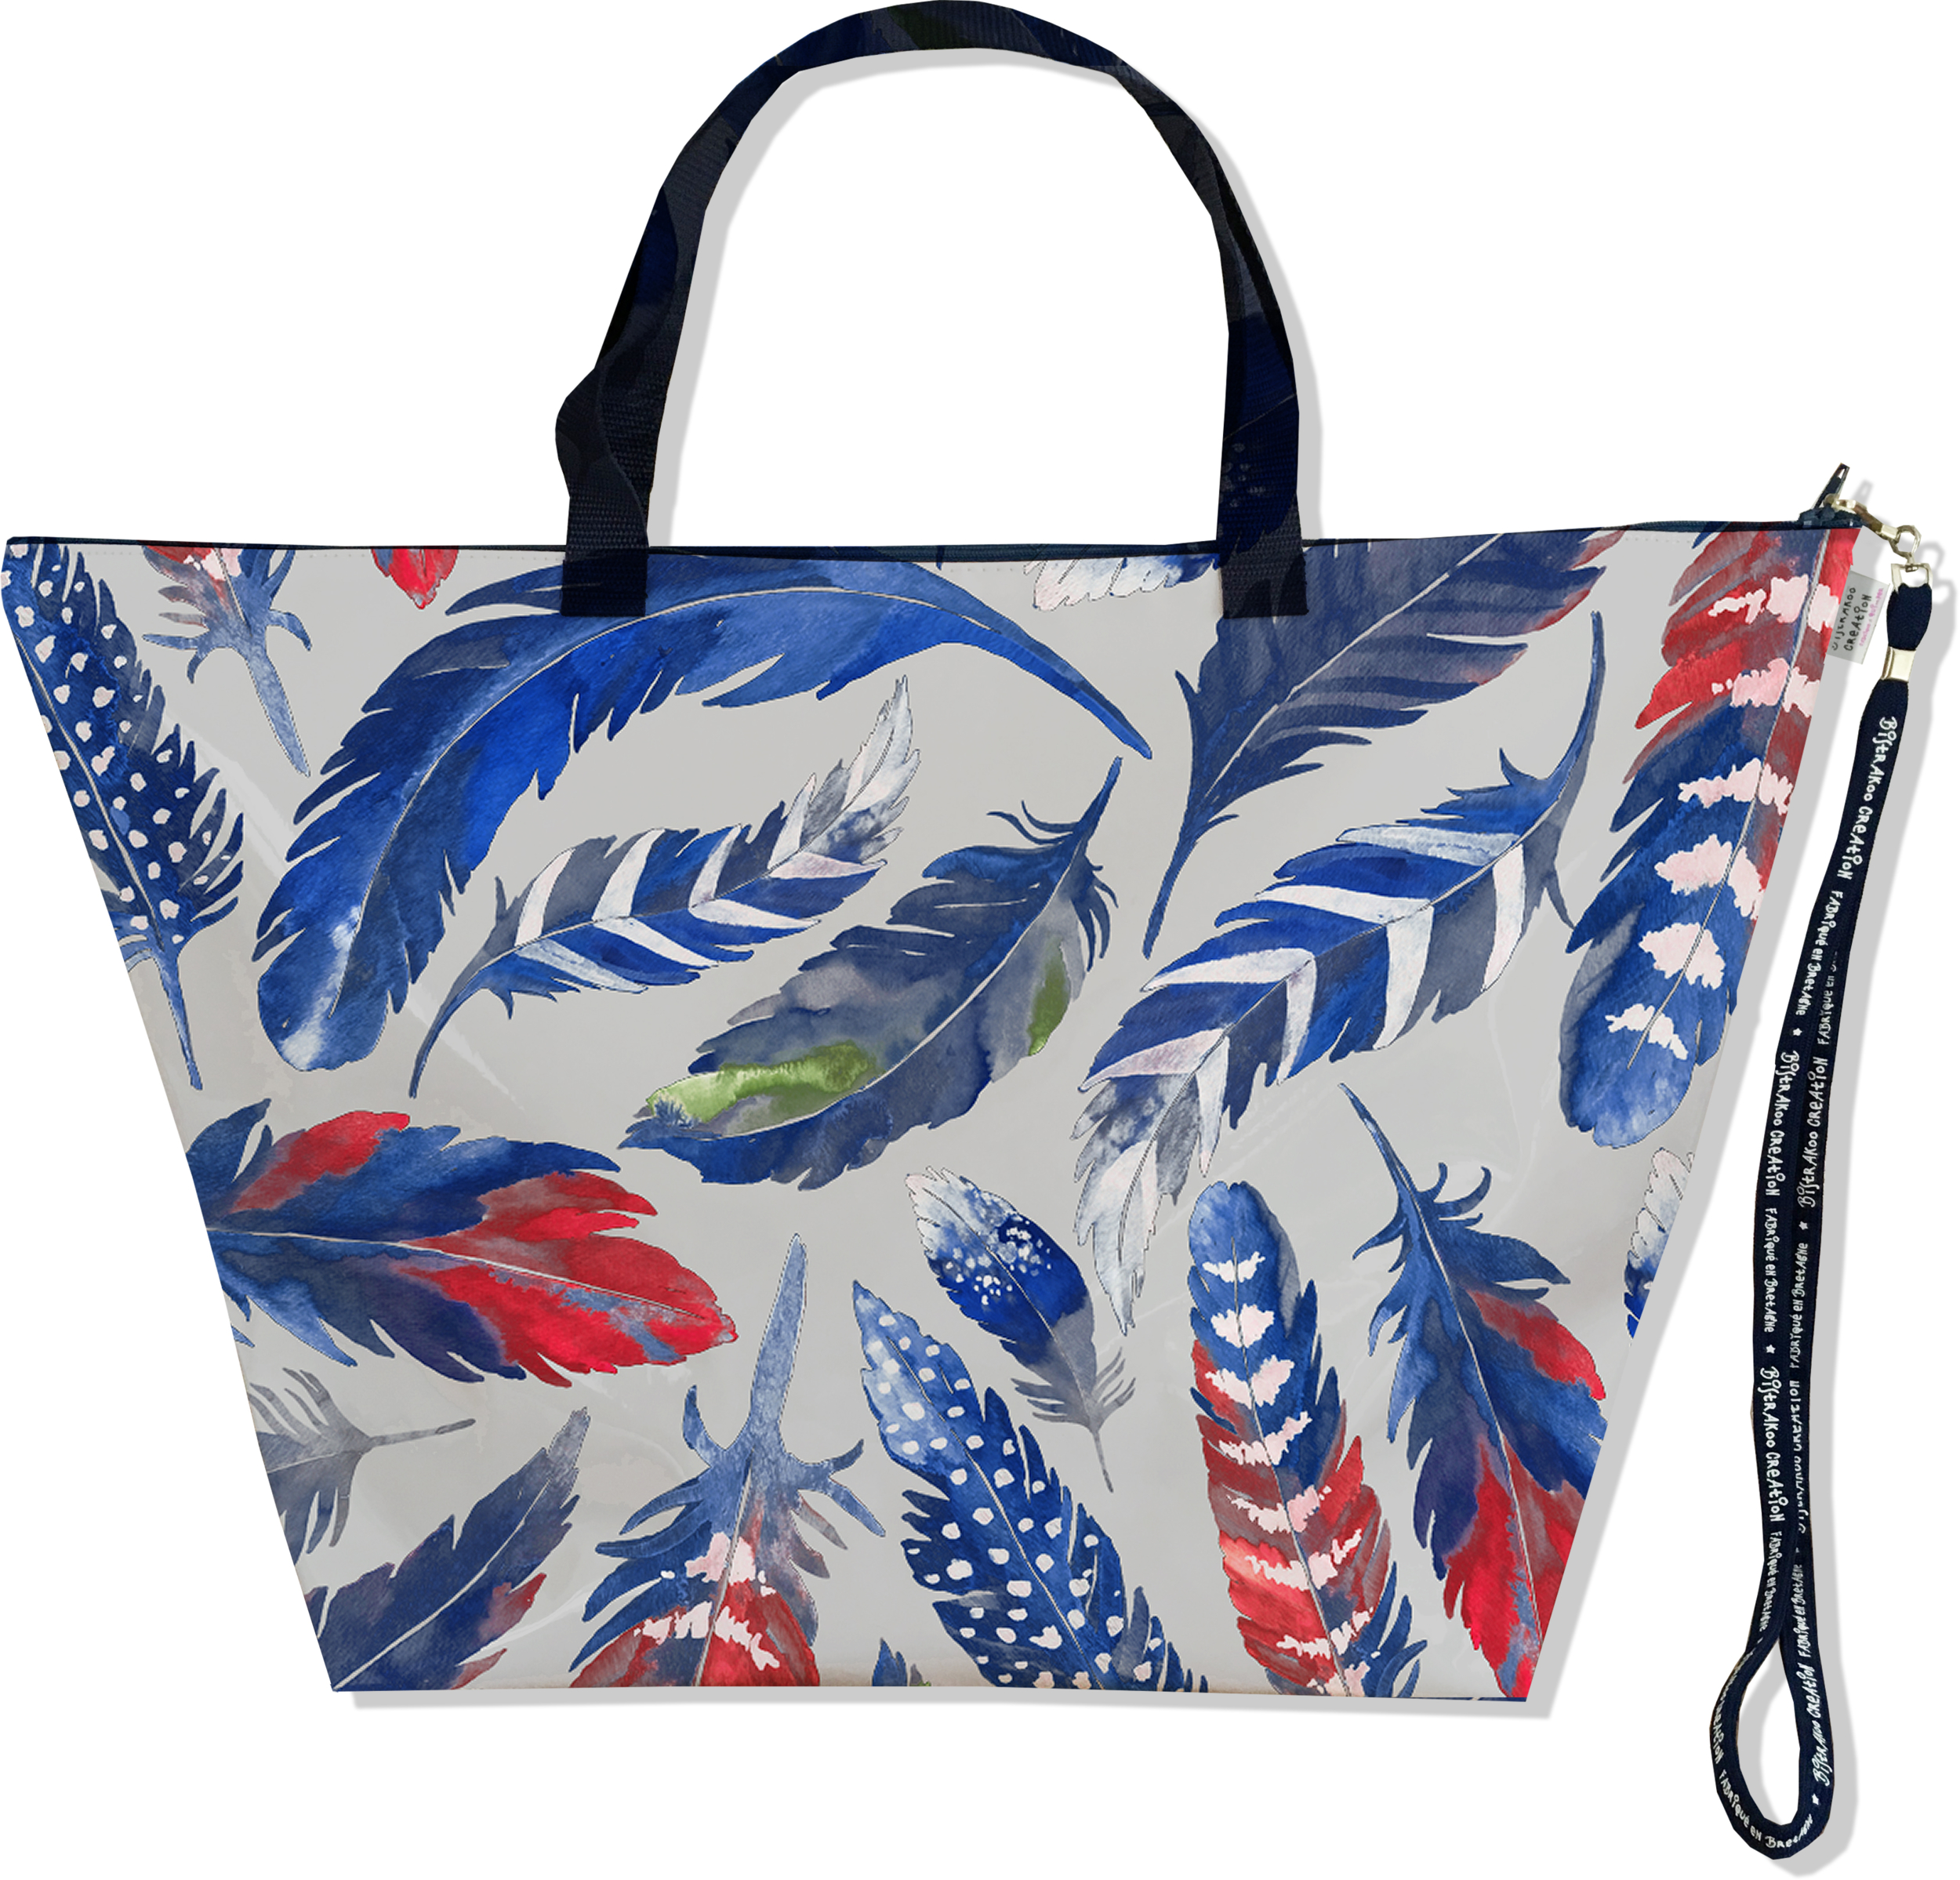 Grand Sac de voyage, sac week end pour femme motif Plumes bleues SW6026